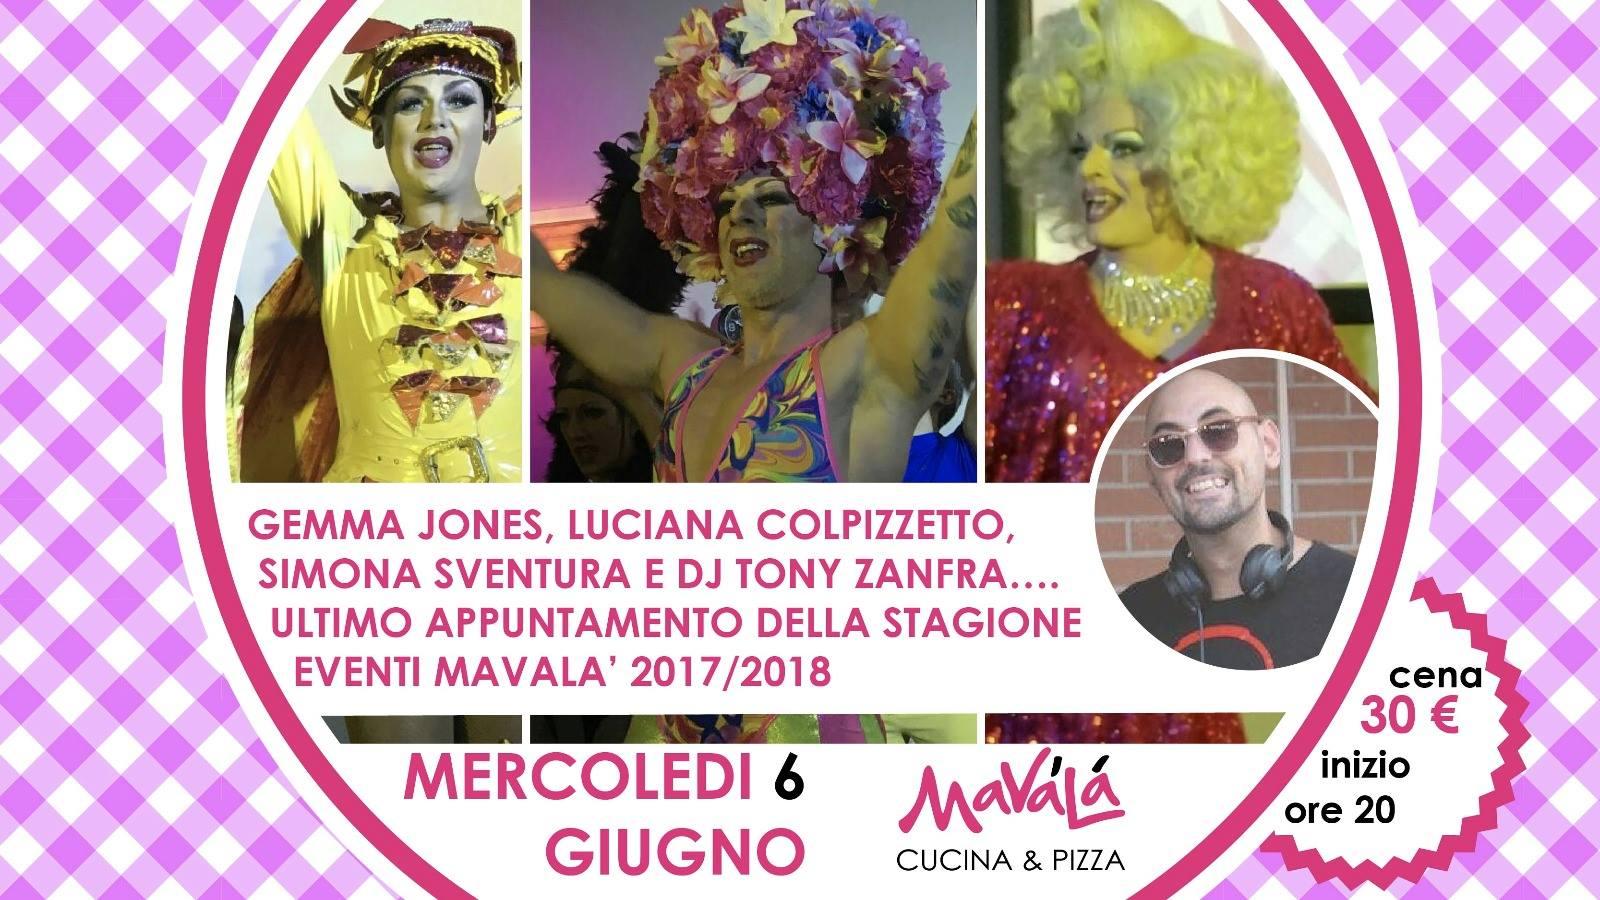 cena+ drag queen show